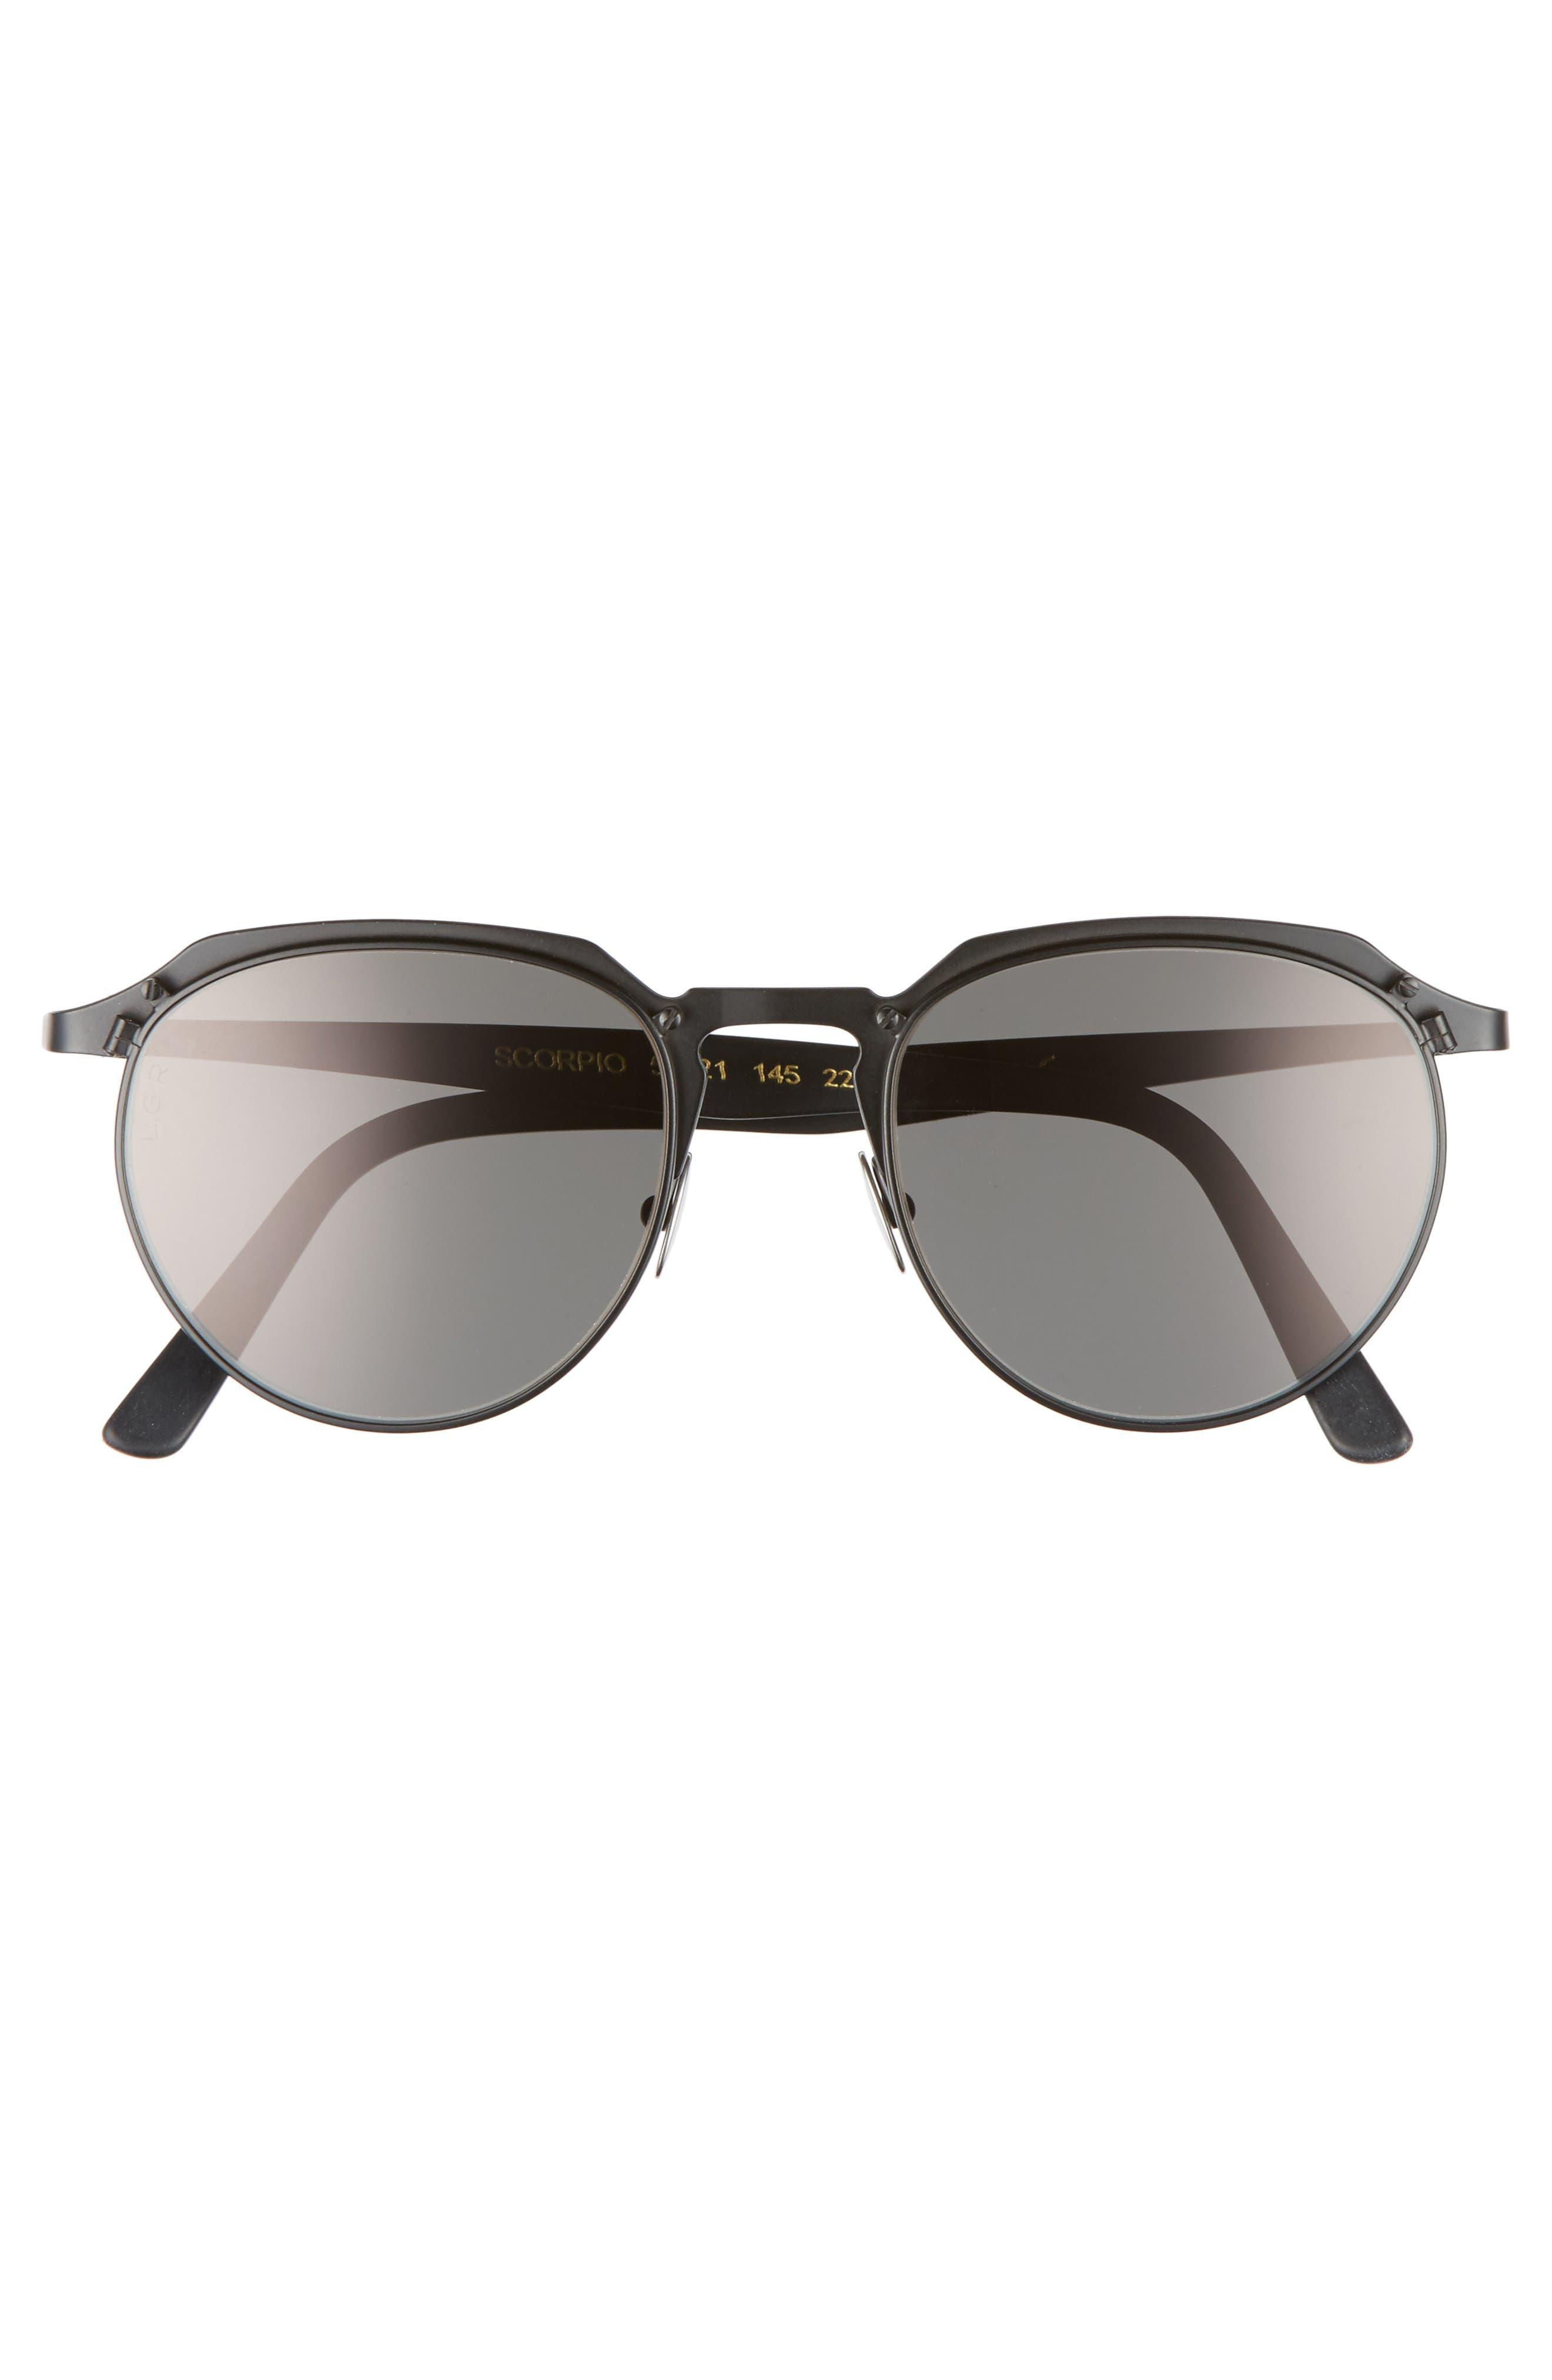 Scorpio 52mm Sunglasses,                             Alternate thumbnail 2, color,                             001